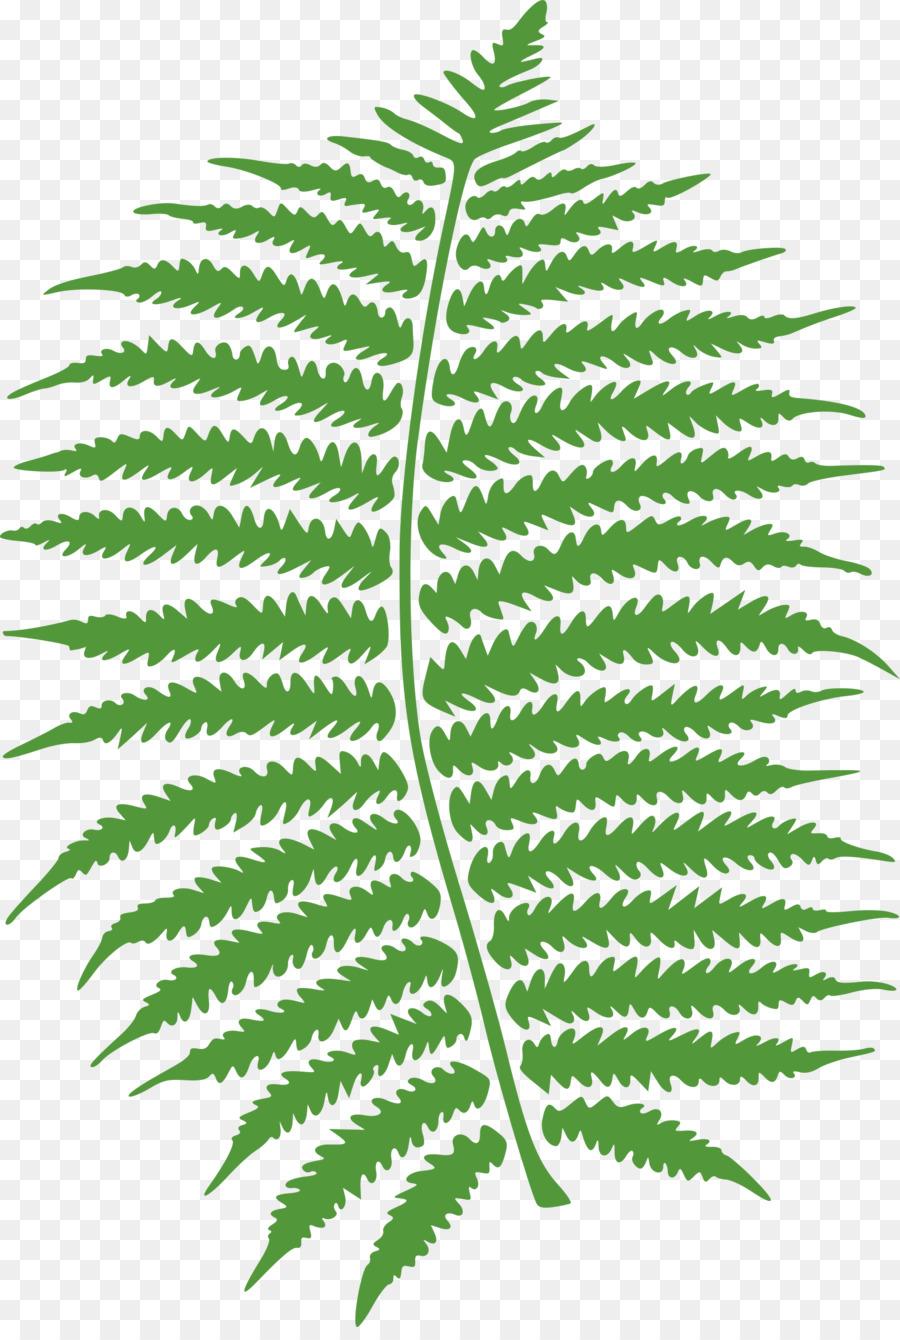 Fern clipart line art. Christmas leaf plant transparent